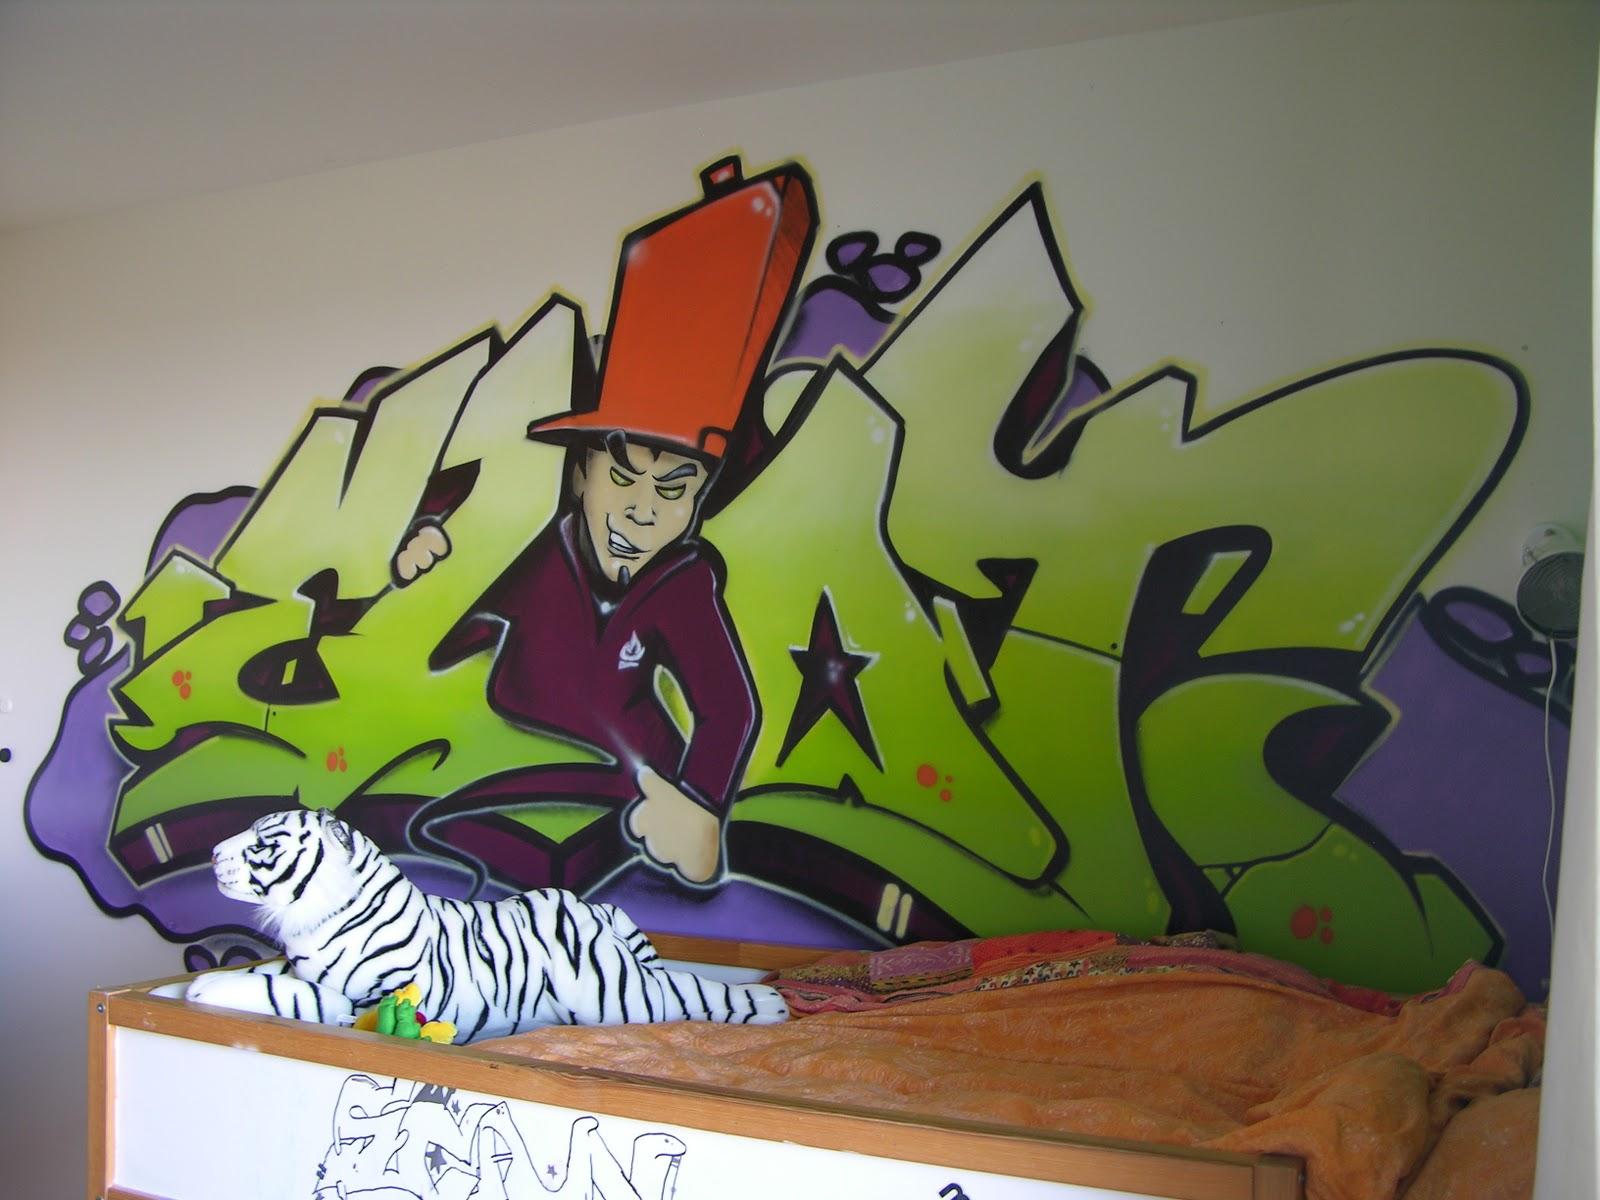 Graffiti sprayer in kinderzimmer